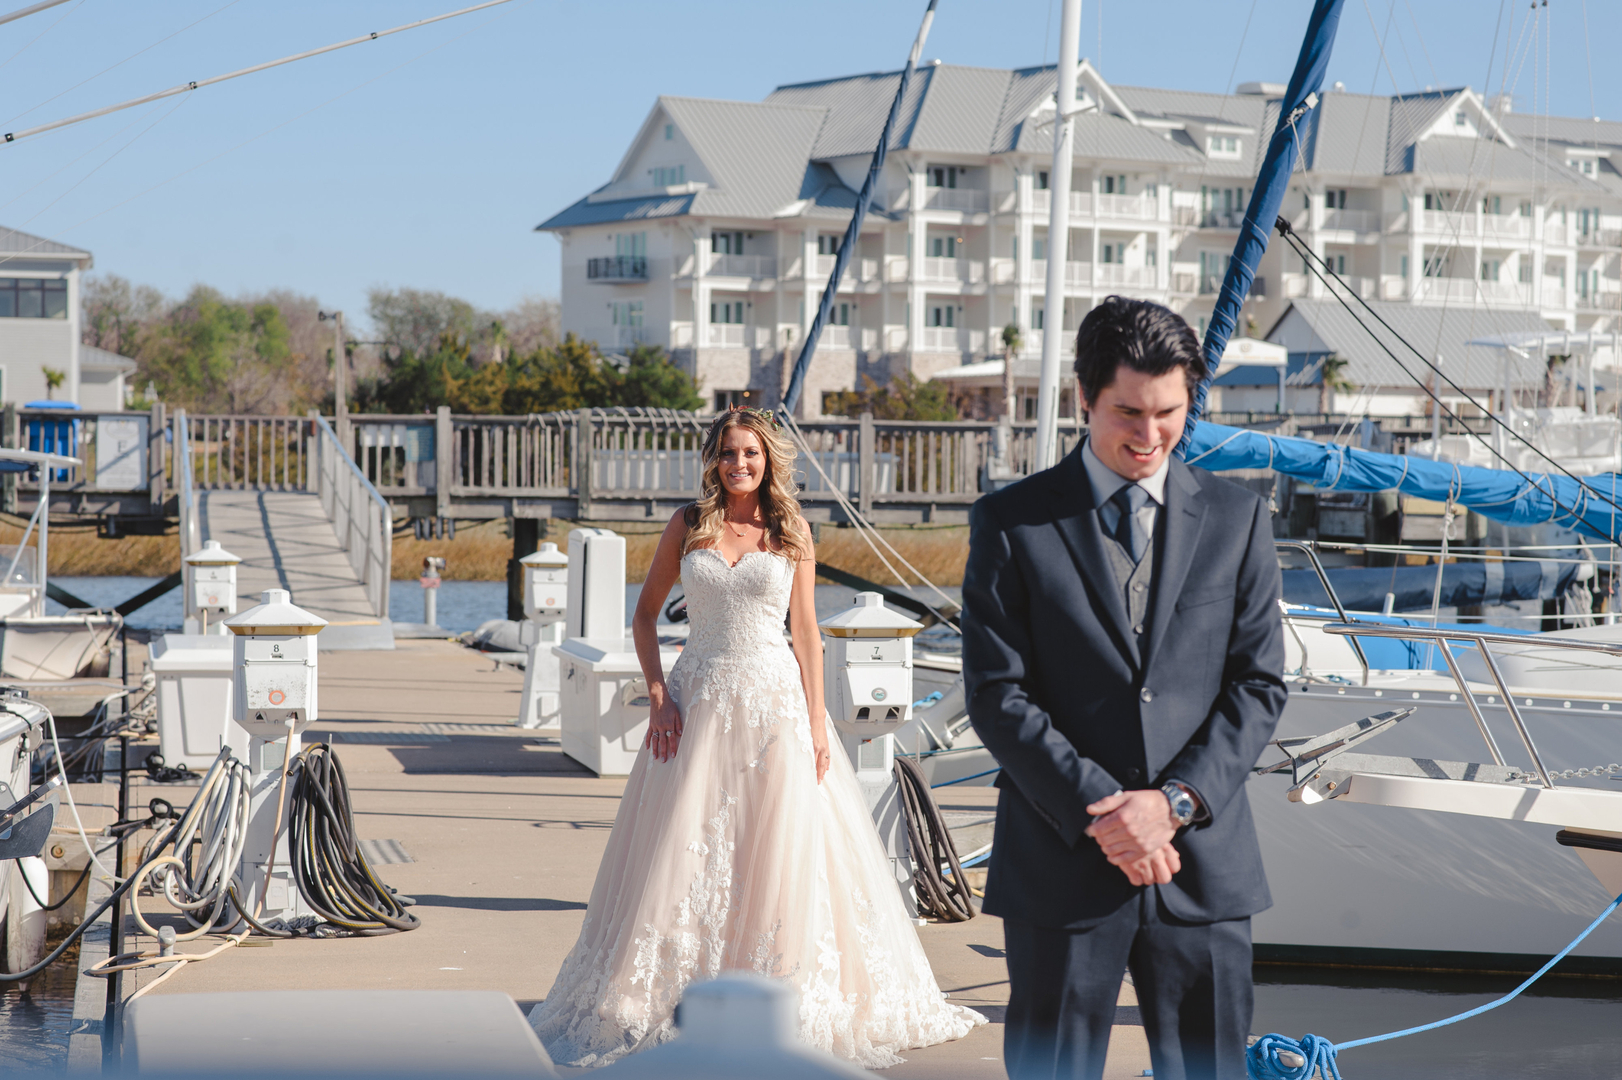 boone-hall-wedding-5.JPG